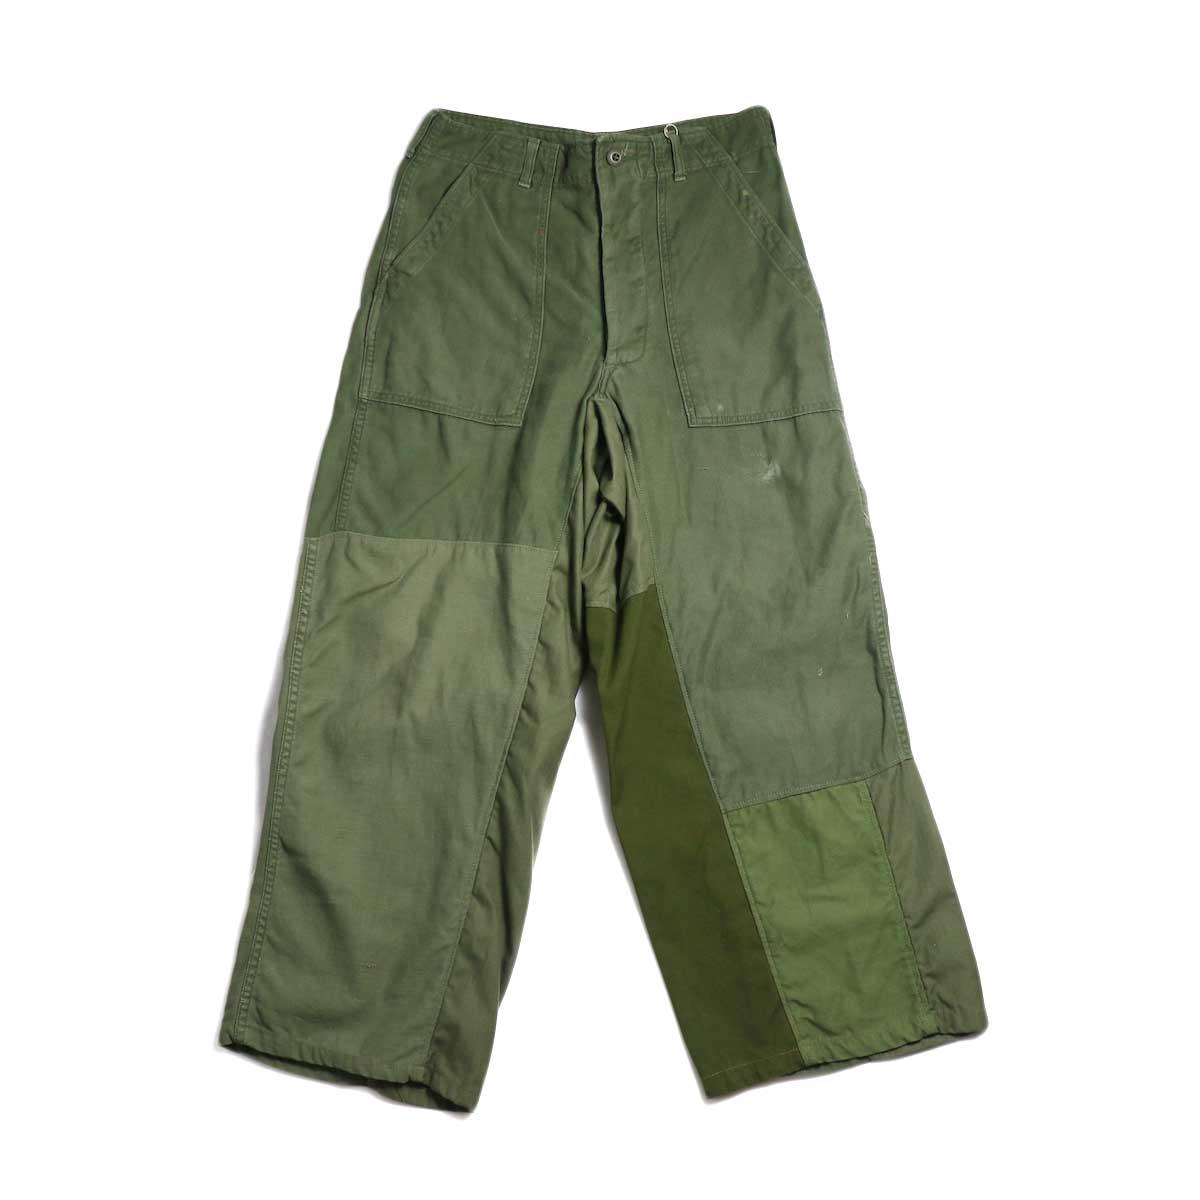 BONUM / Military FAT Pants (A) 正面